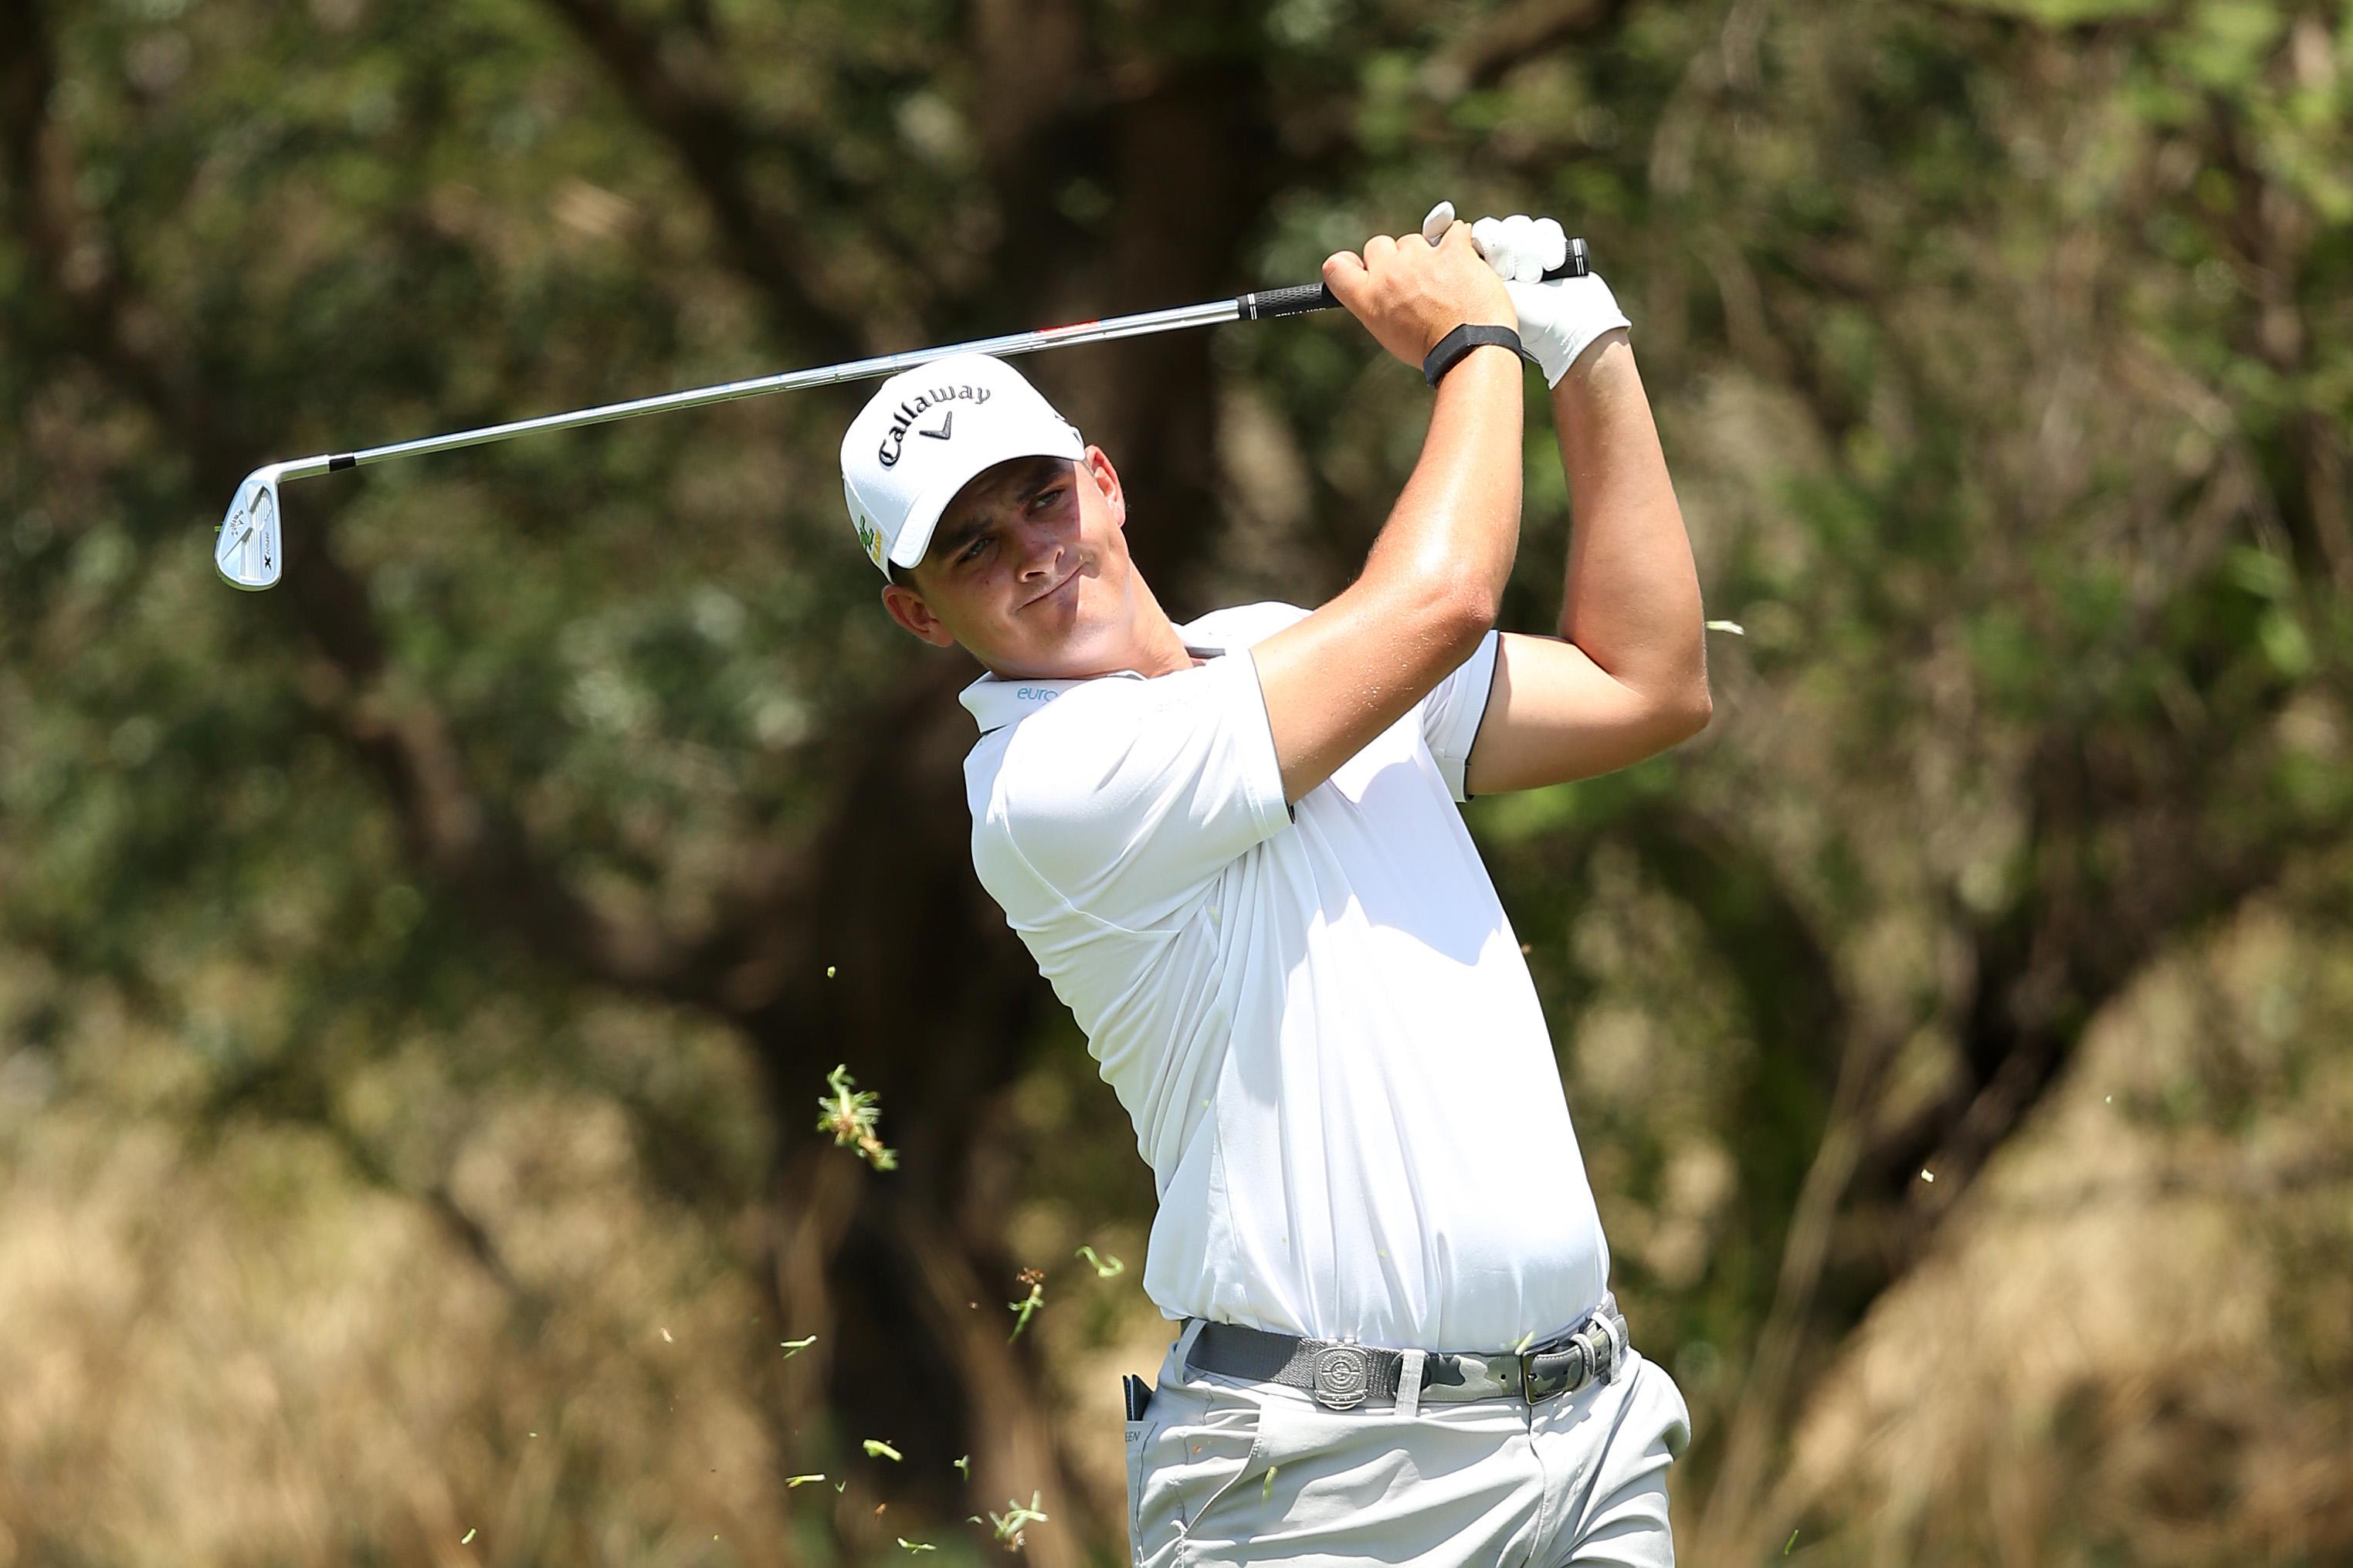 Christiaan Bezuidenhout practicising at the 2019 Nedbank Golf Challenge at Sun City